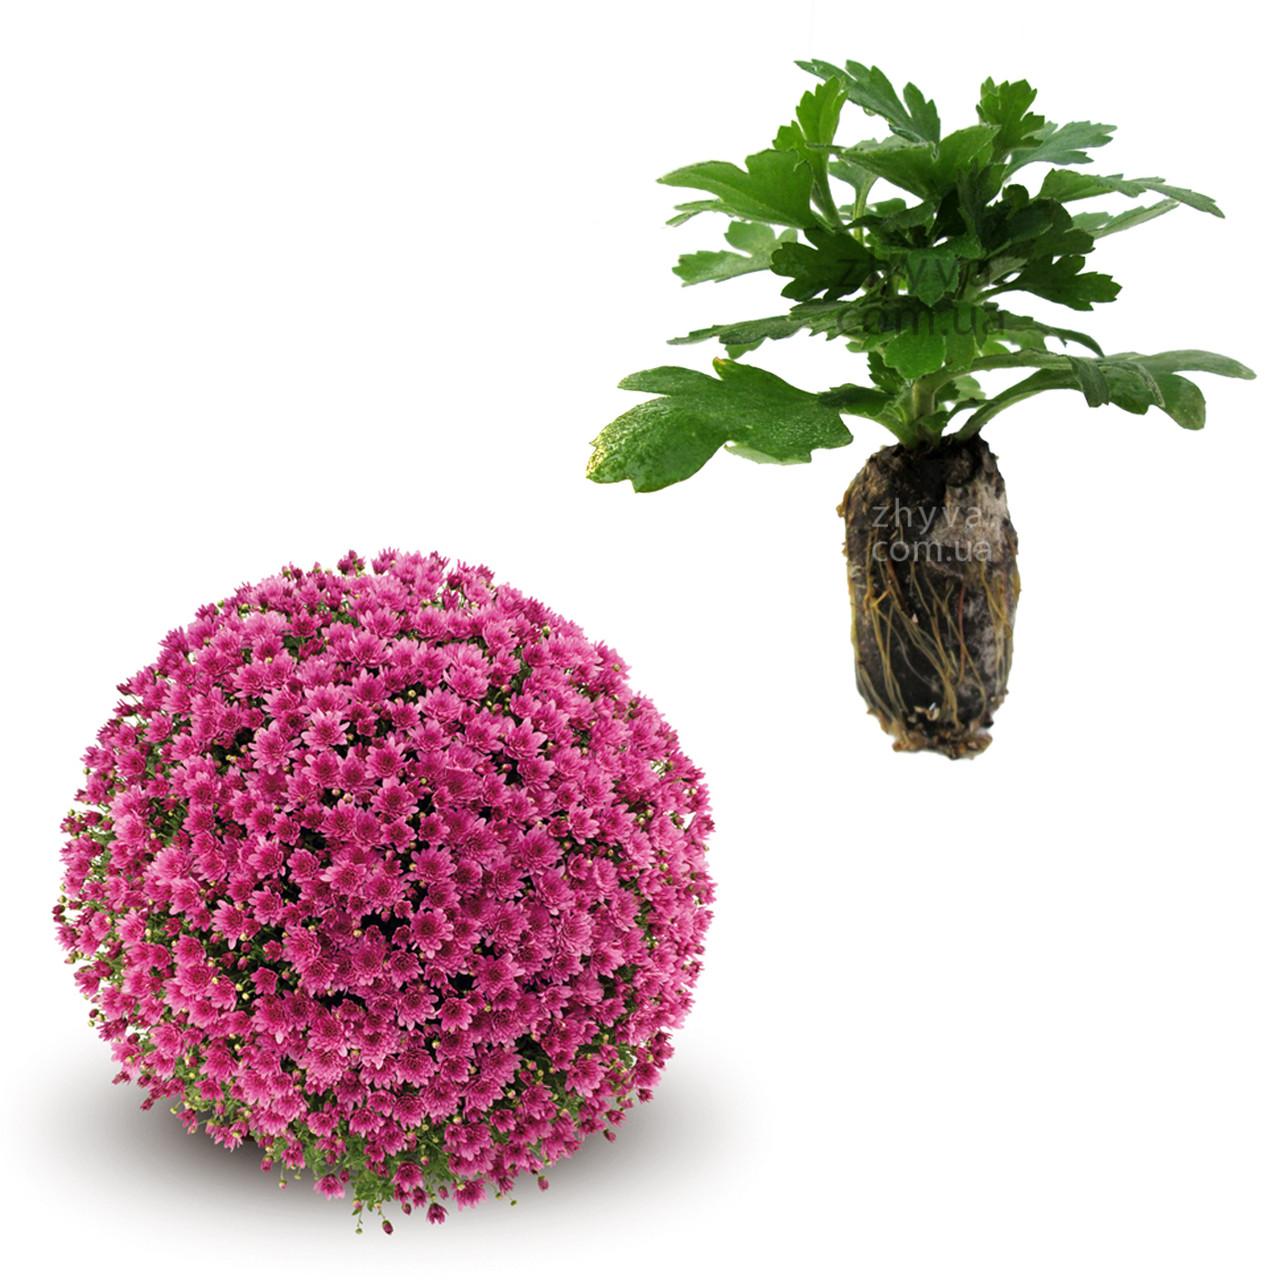 "Саджанці Хризантема Multiflora ""Proxima Violet'' 1шт / Рассада Хризантема Multiflora ""Proxima Violet''"